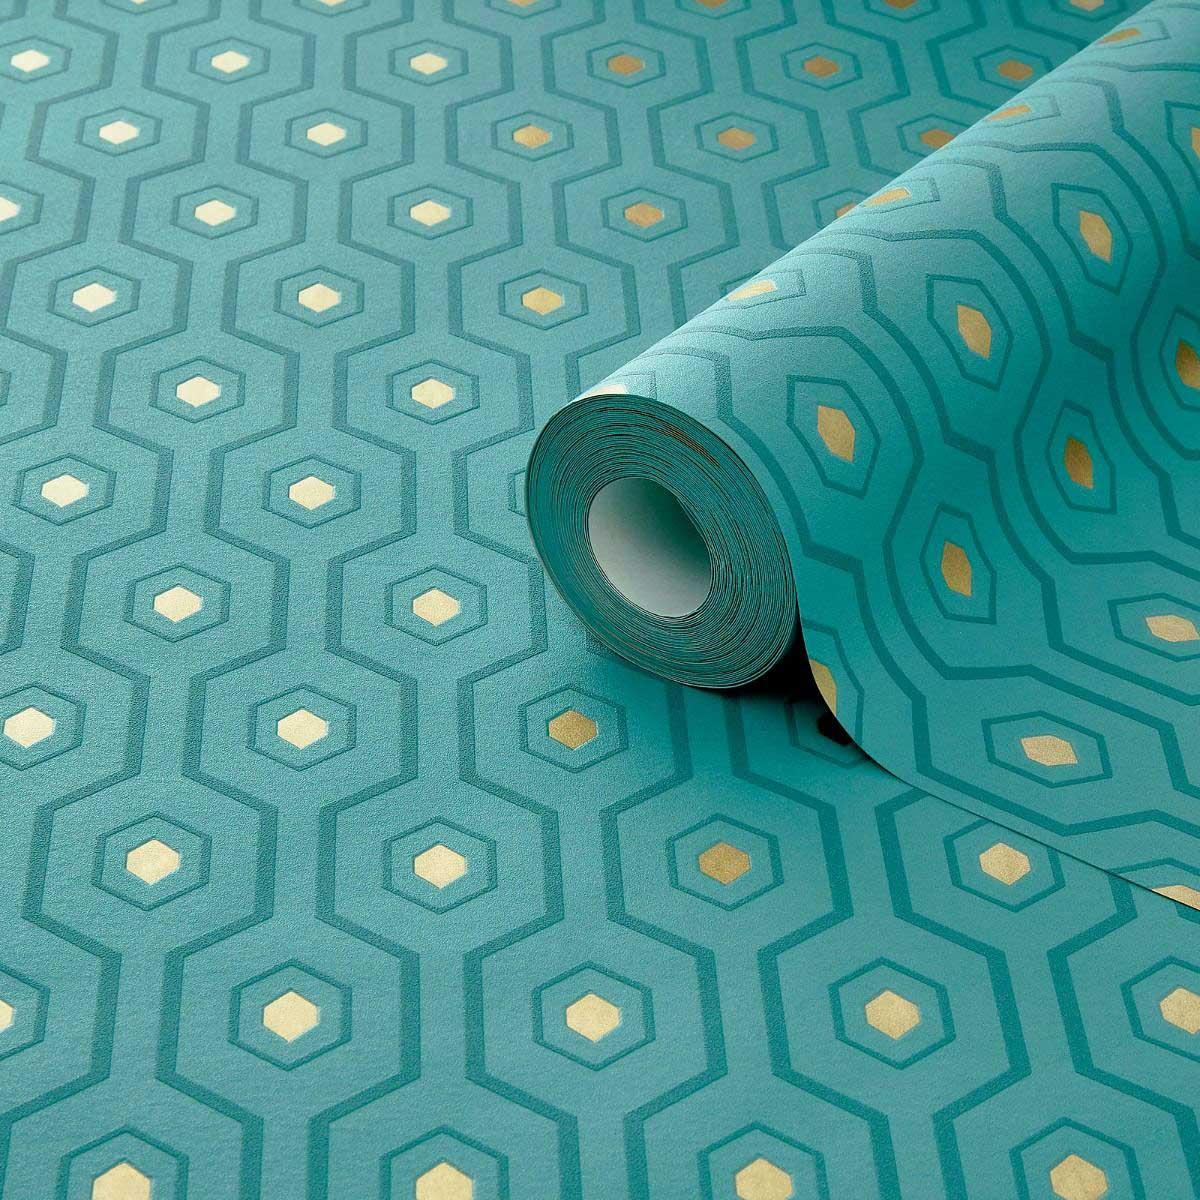 Vliestapete Geometrie Muster Grun Gold Tapetenwelt